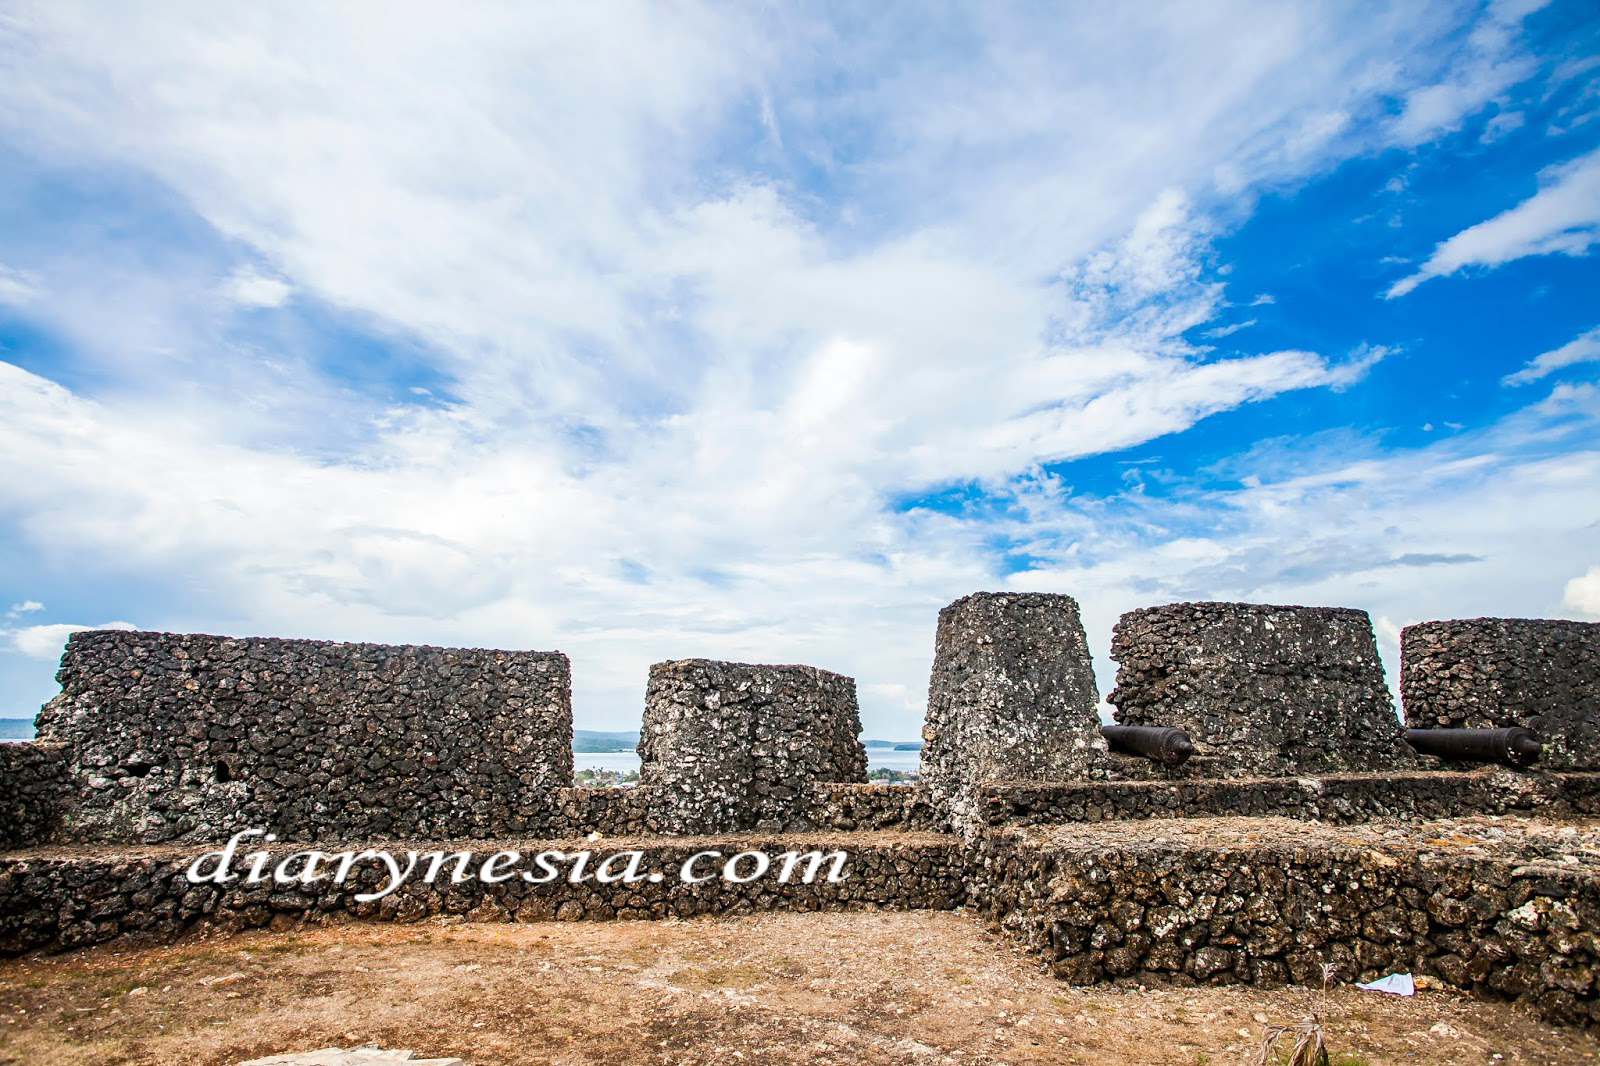 Buton Tourism, Southeast Sulawesi Tourism, Best Tourist Attractions in Southeast Sulawesi, diarynesia